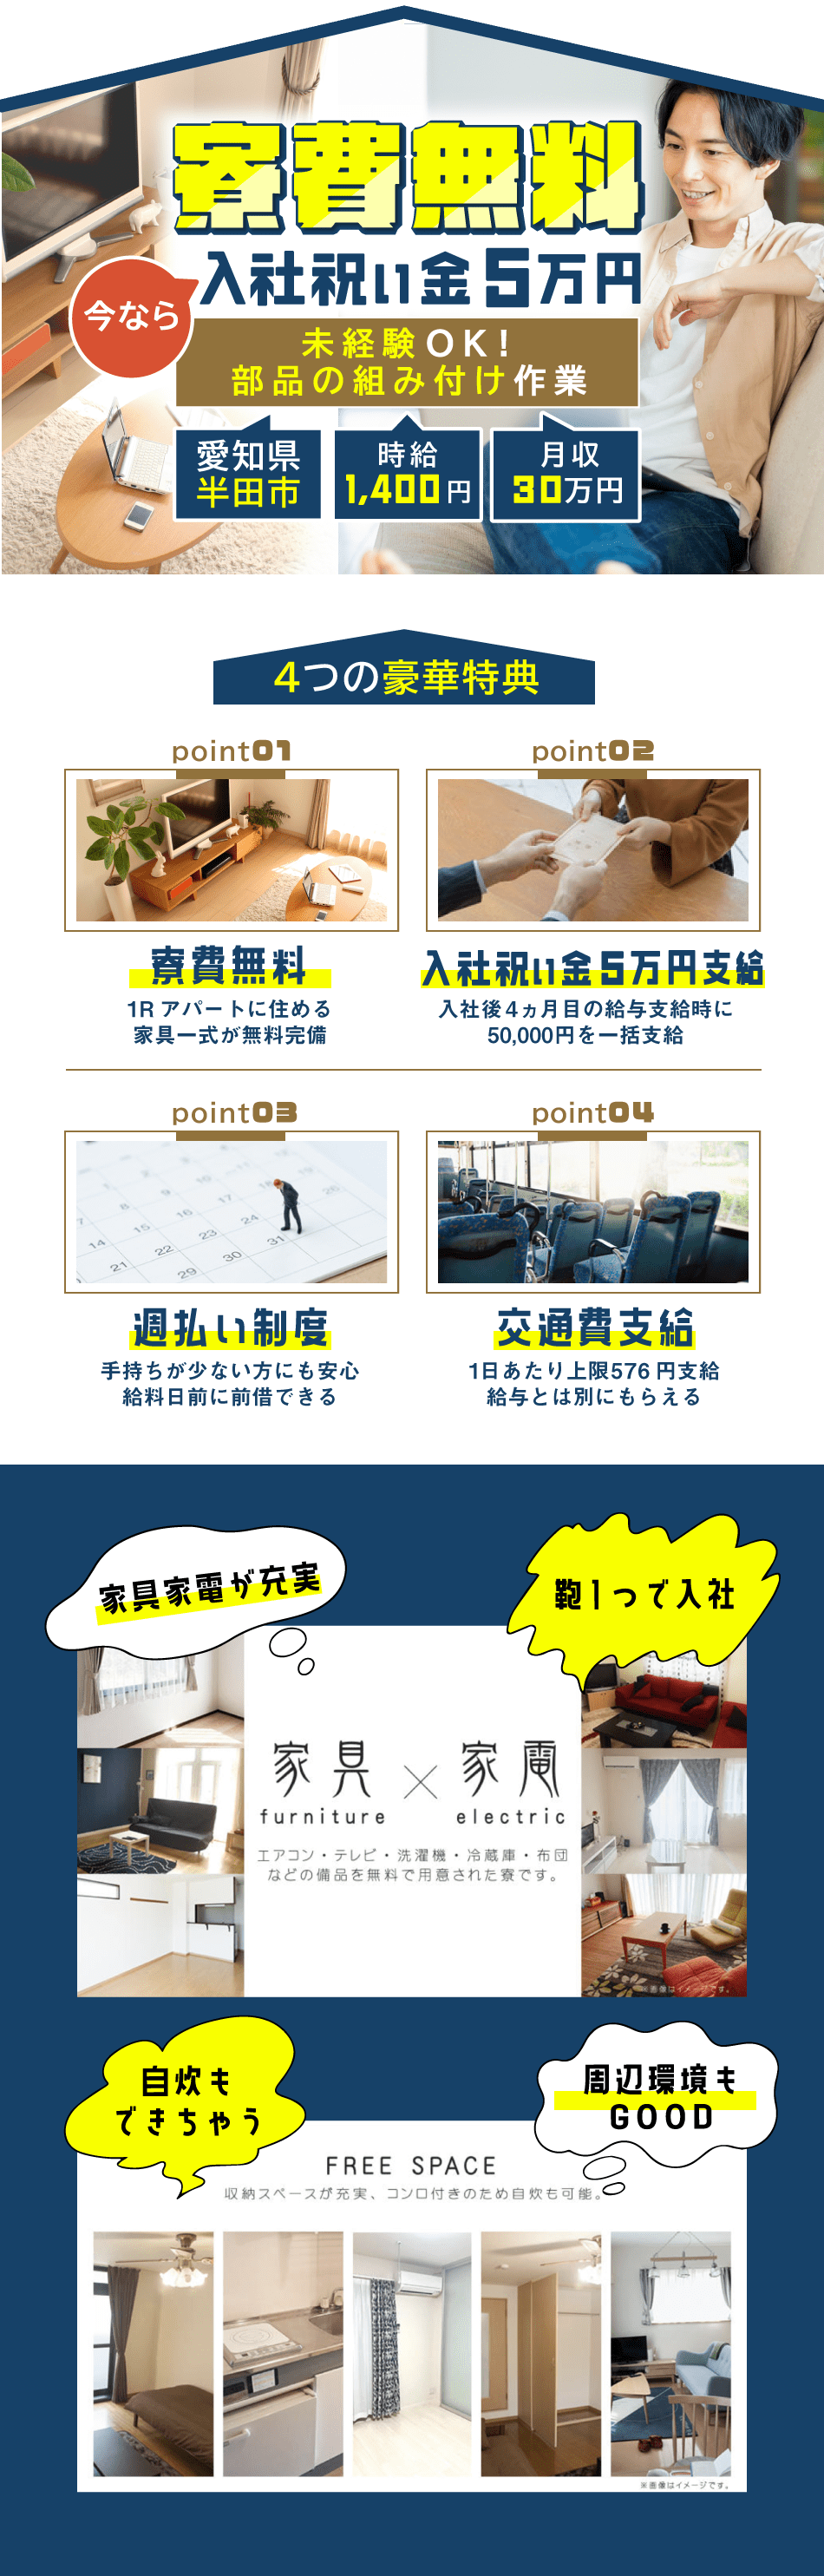 寮費無料 入社祝い金5万円